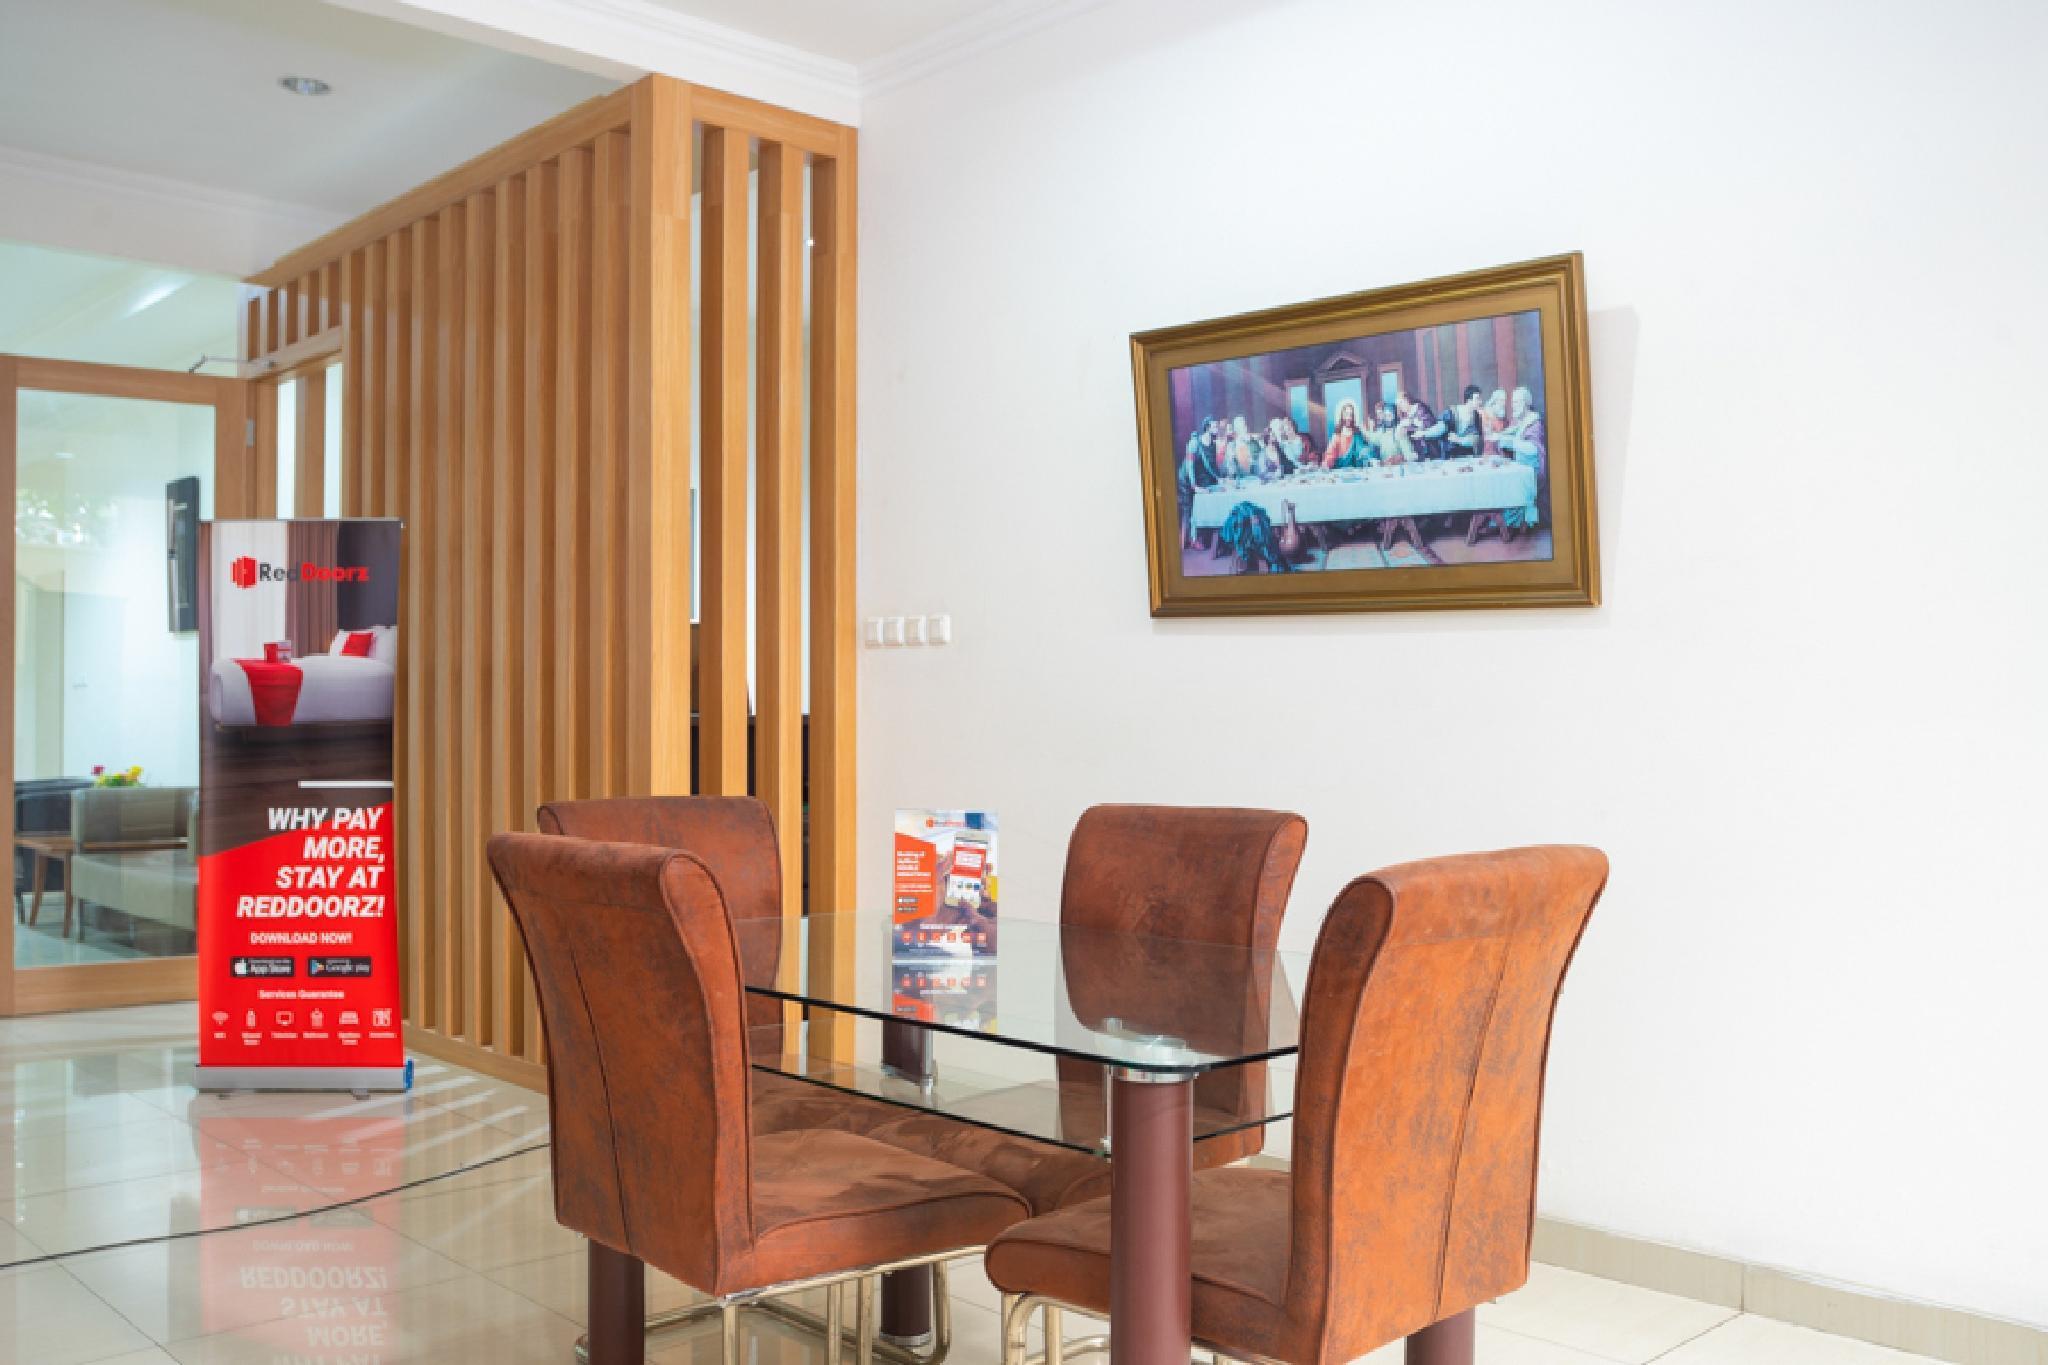 Reddoorz Plus Near Siloam Karawaci Binong Tangerang Mulai